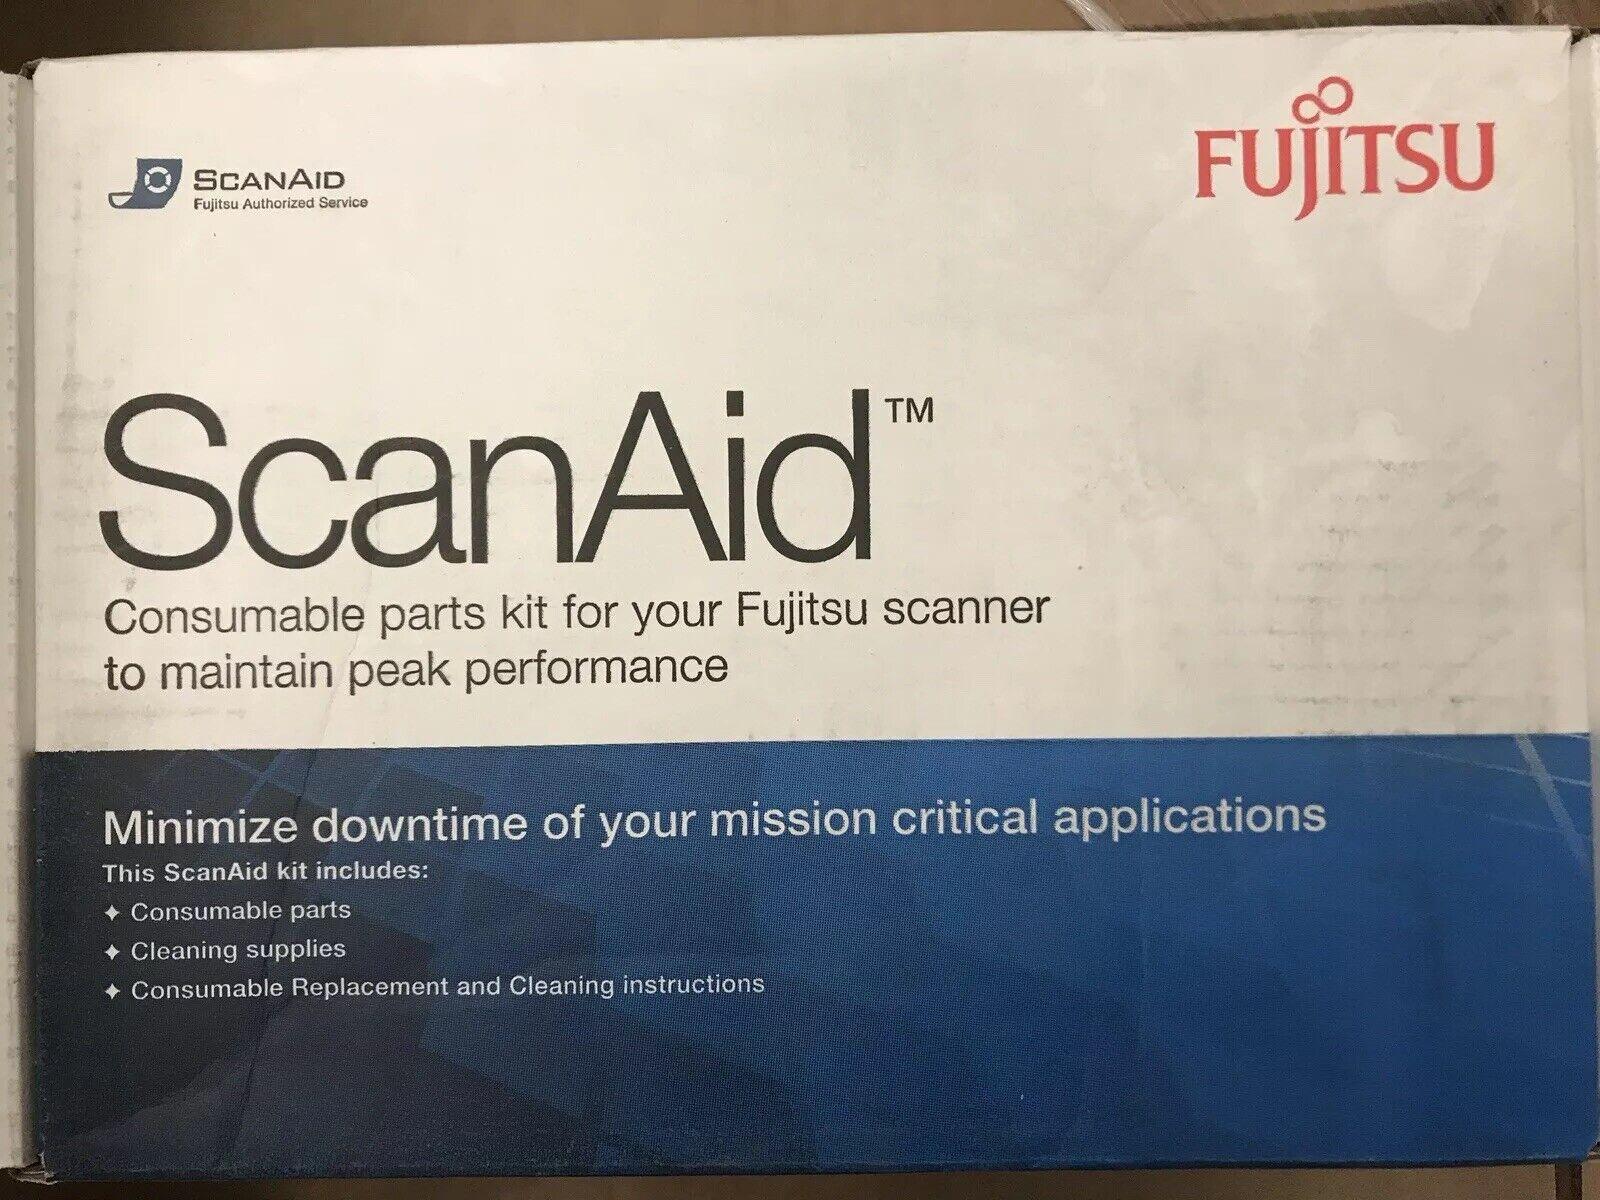 Fujitsu ScanAid Kit CG01000-280401